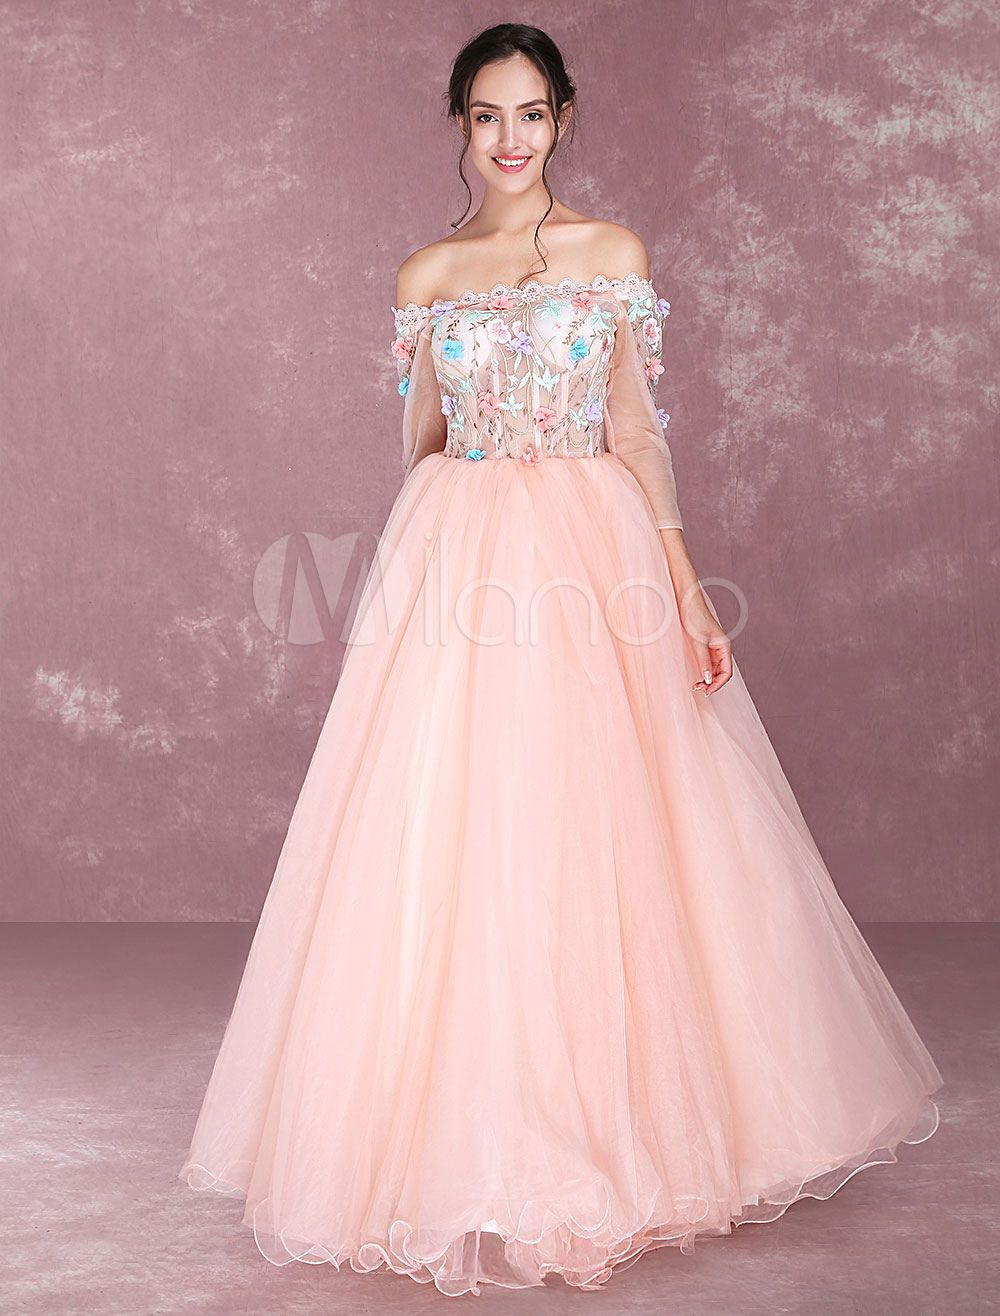 Orange Quinceanera Dresses Tulle Off The Shoulder Prom Dresses ...